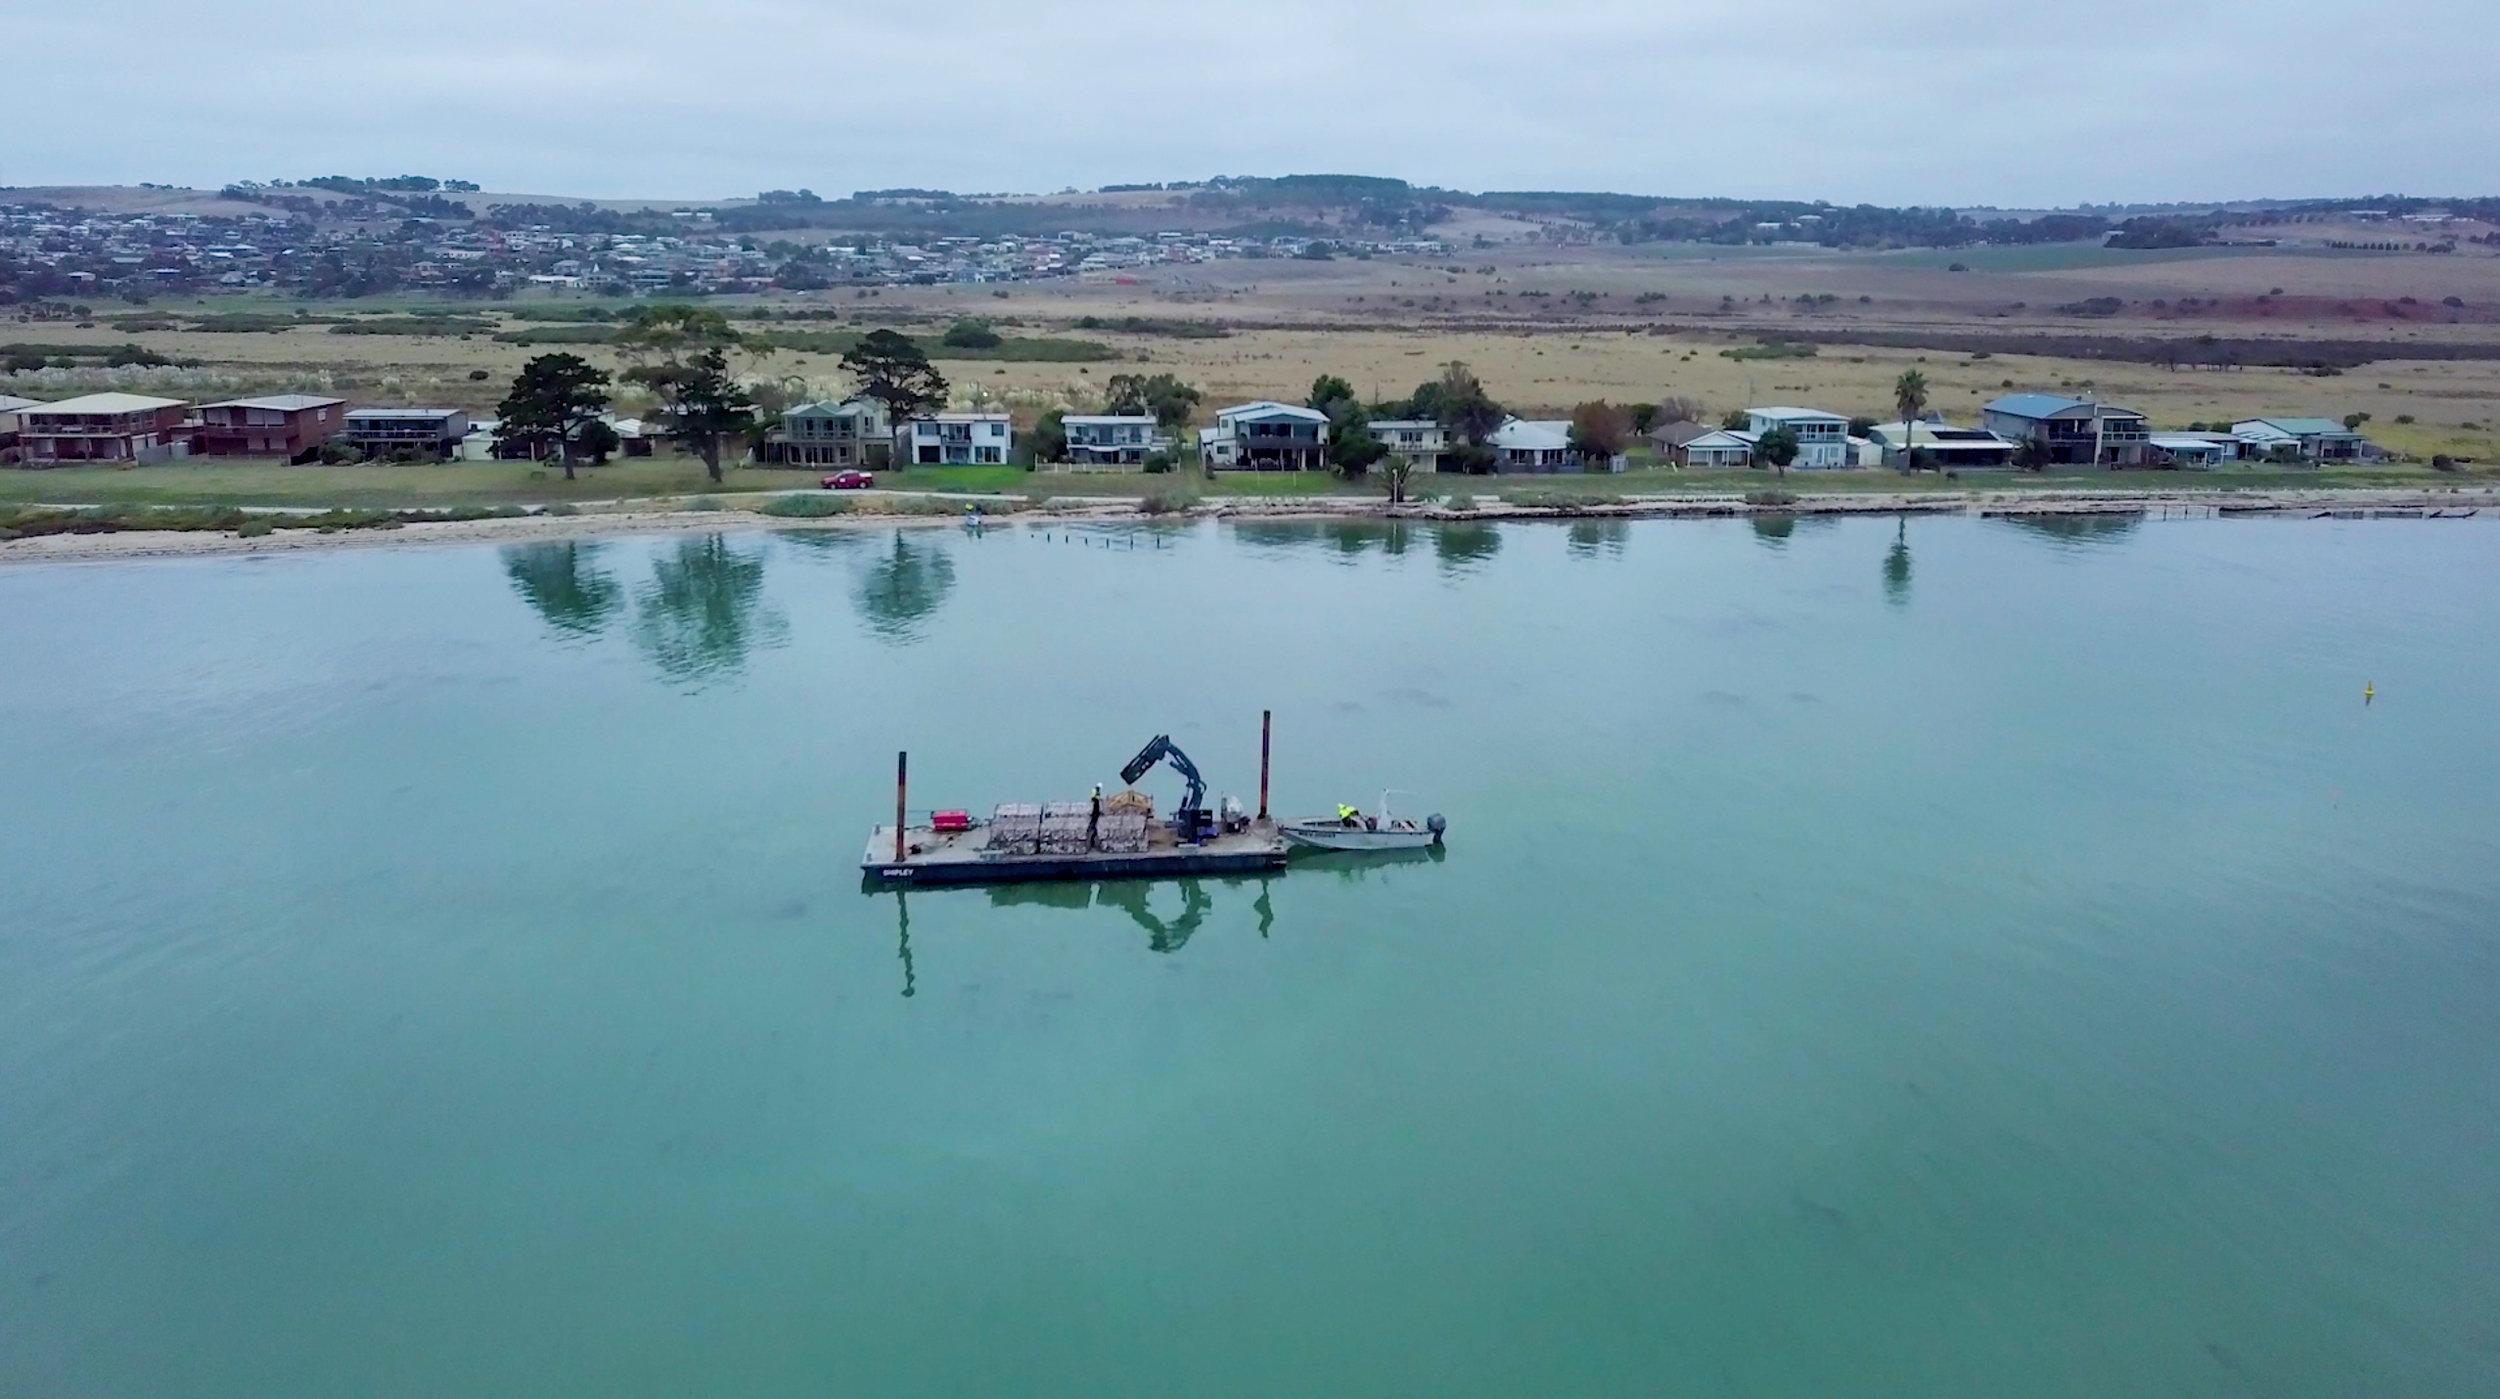 Drone image of reef installation off the coast of Portarlington, Victoria